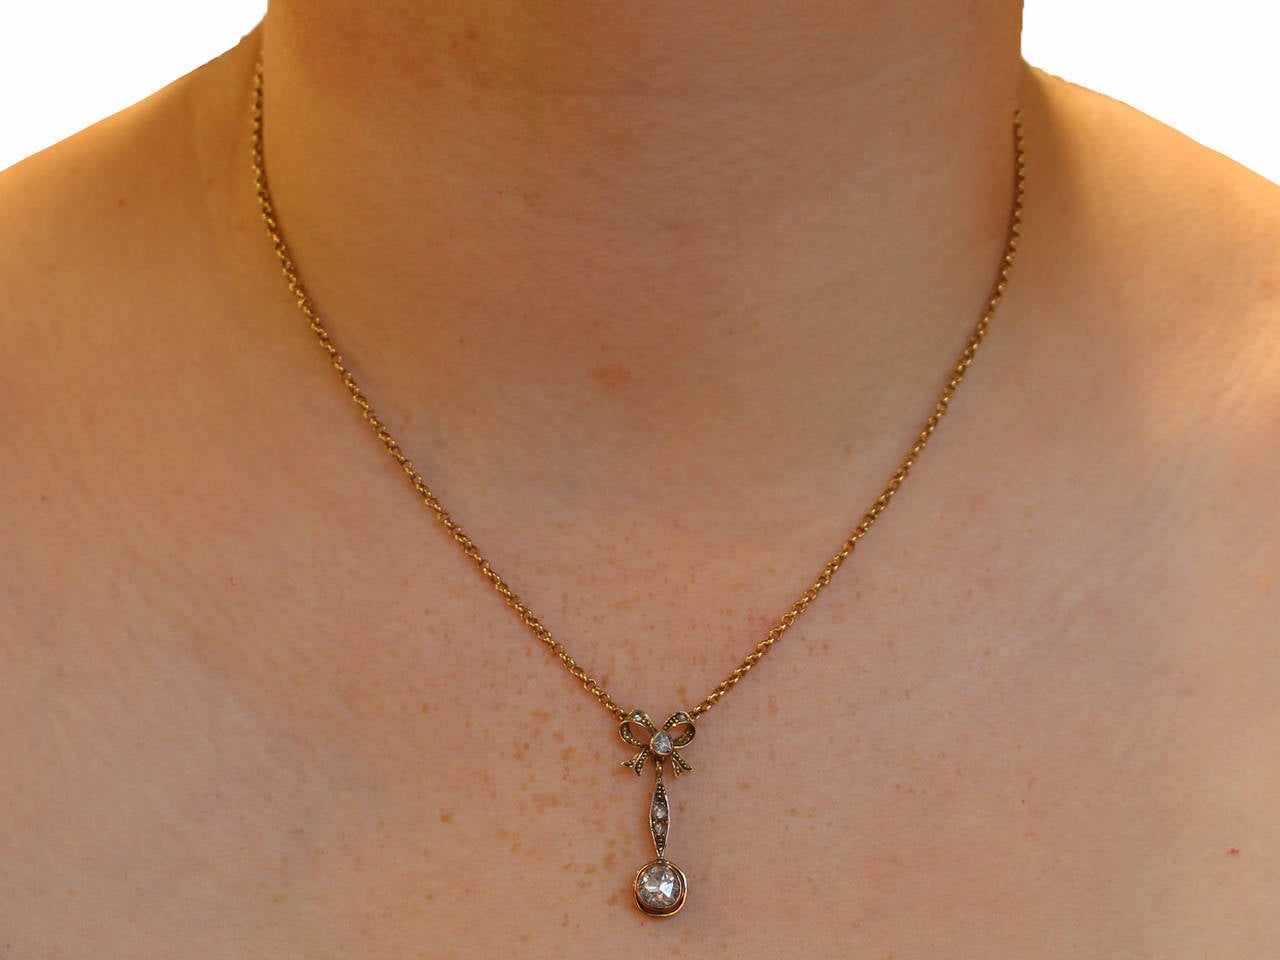 1.15Ct Diamond, 14k Yellow Gold Bow Pendant - Antique French Circa 1910 8